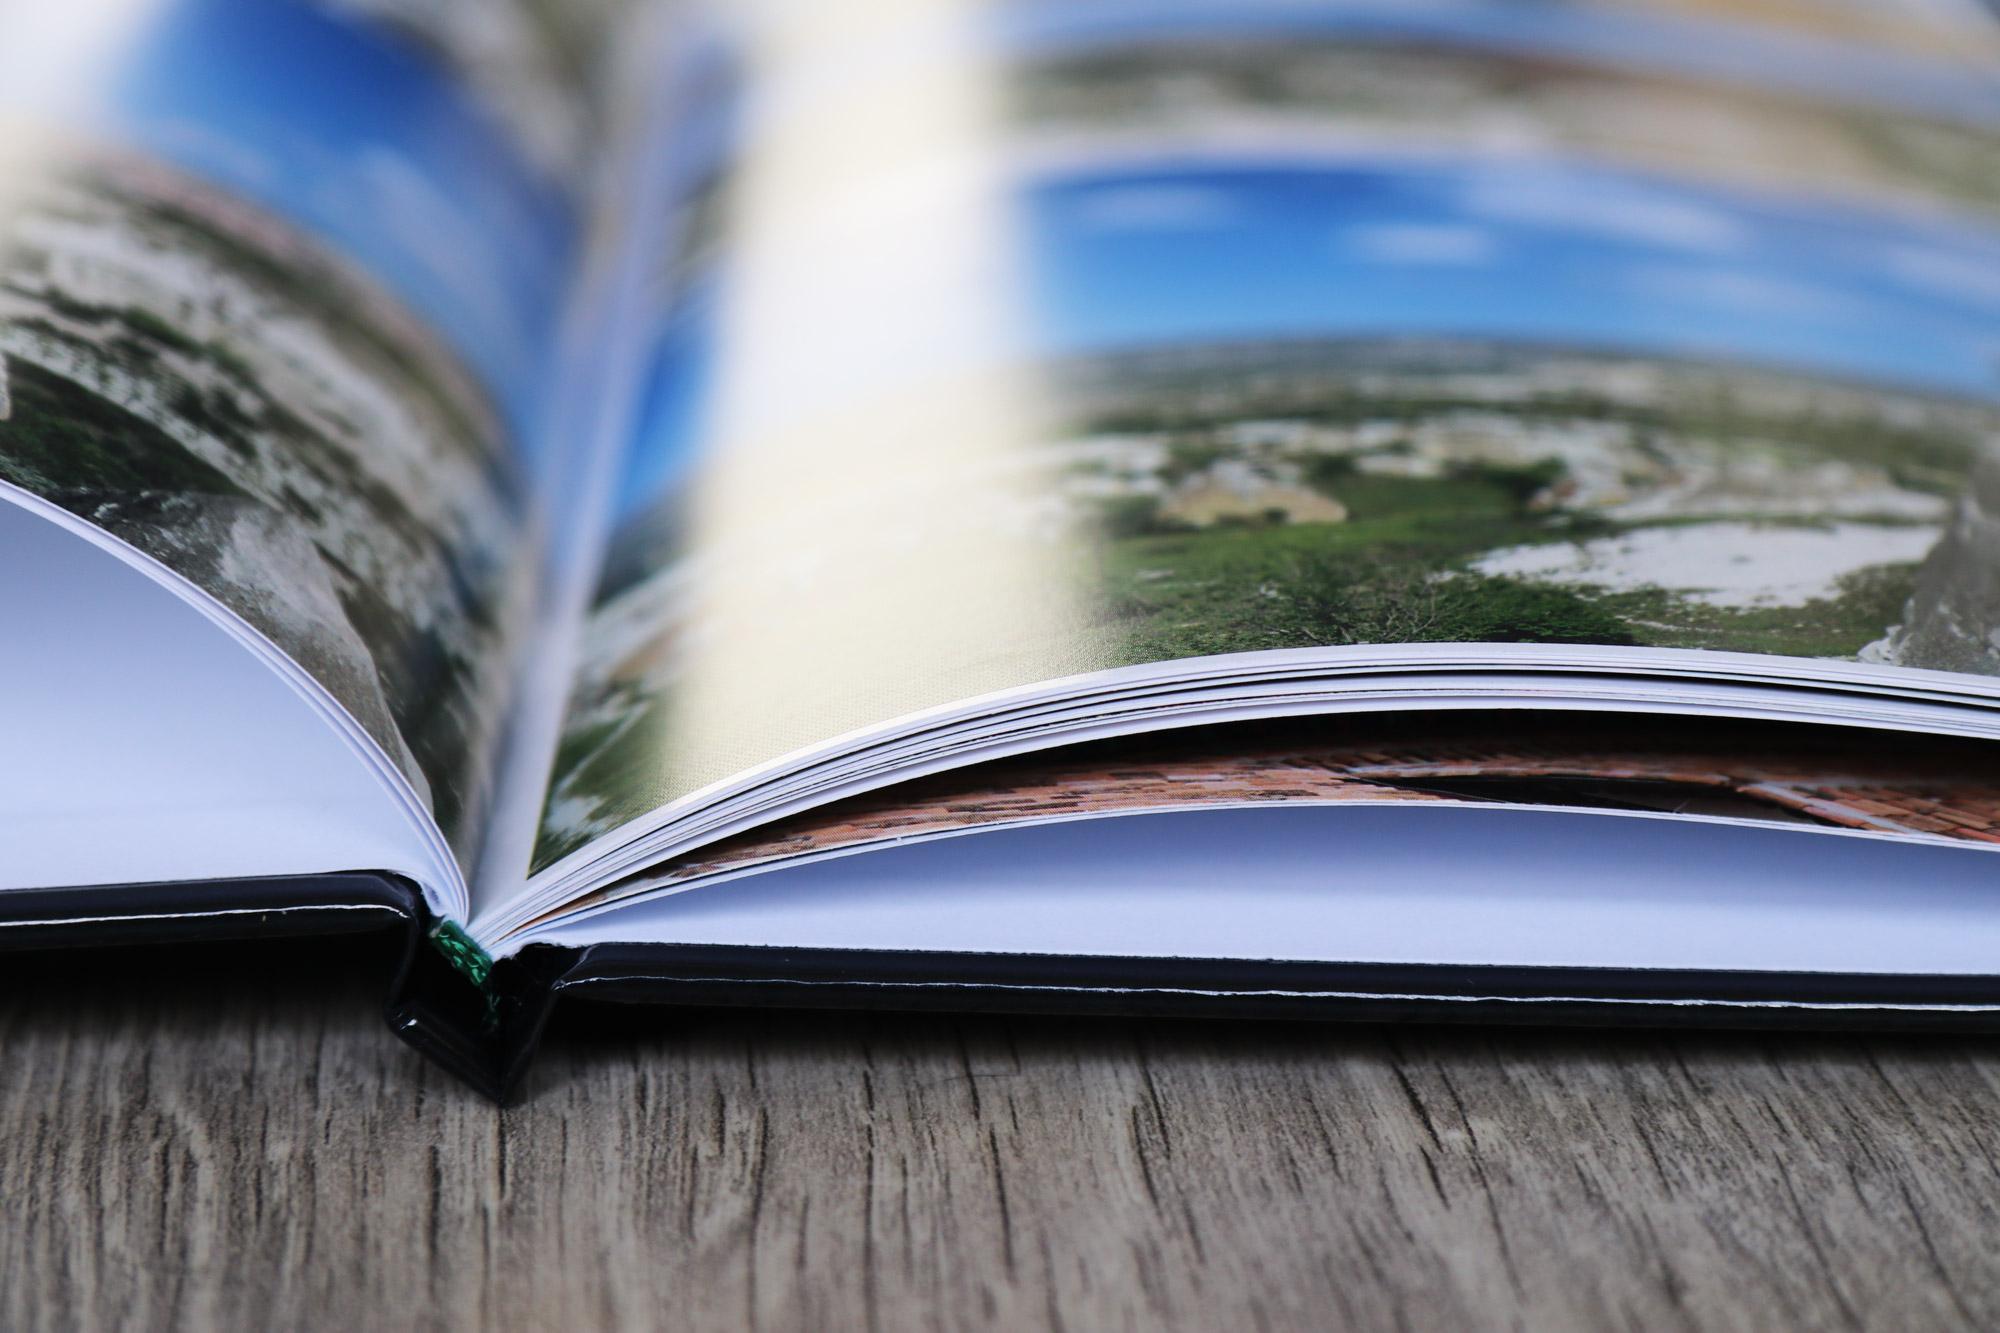 Review: Fotoboek van Fotofabriek